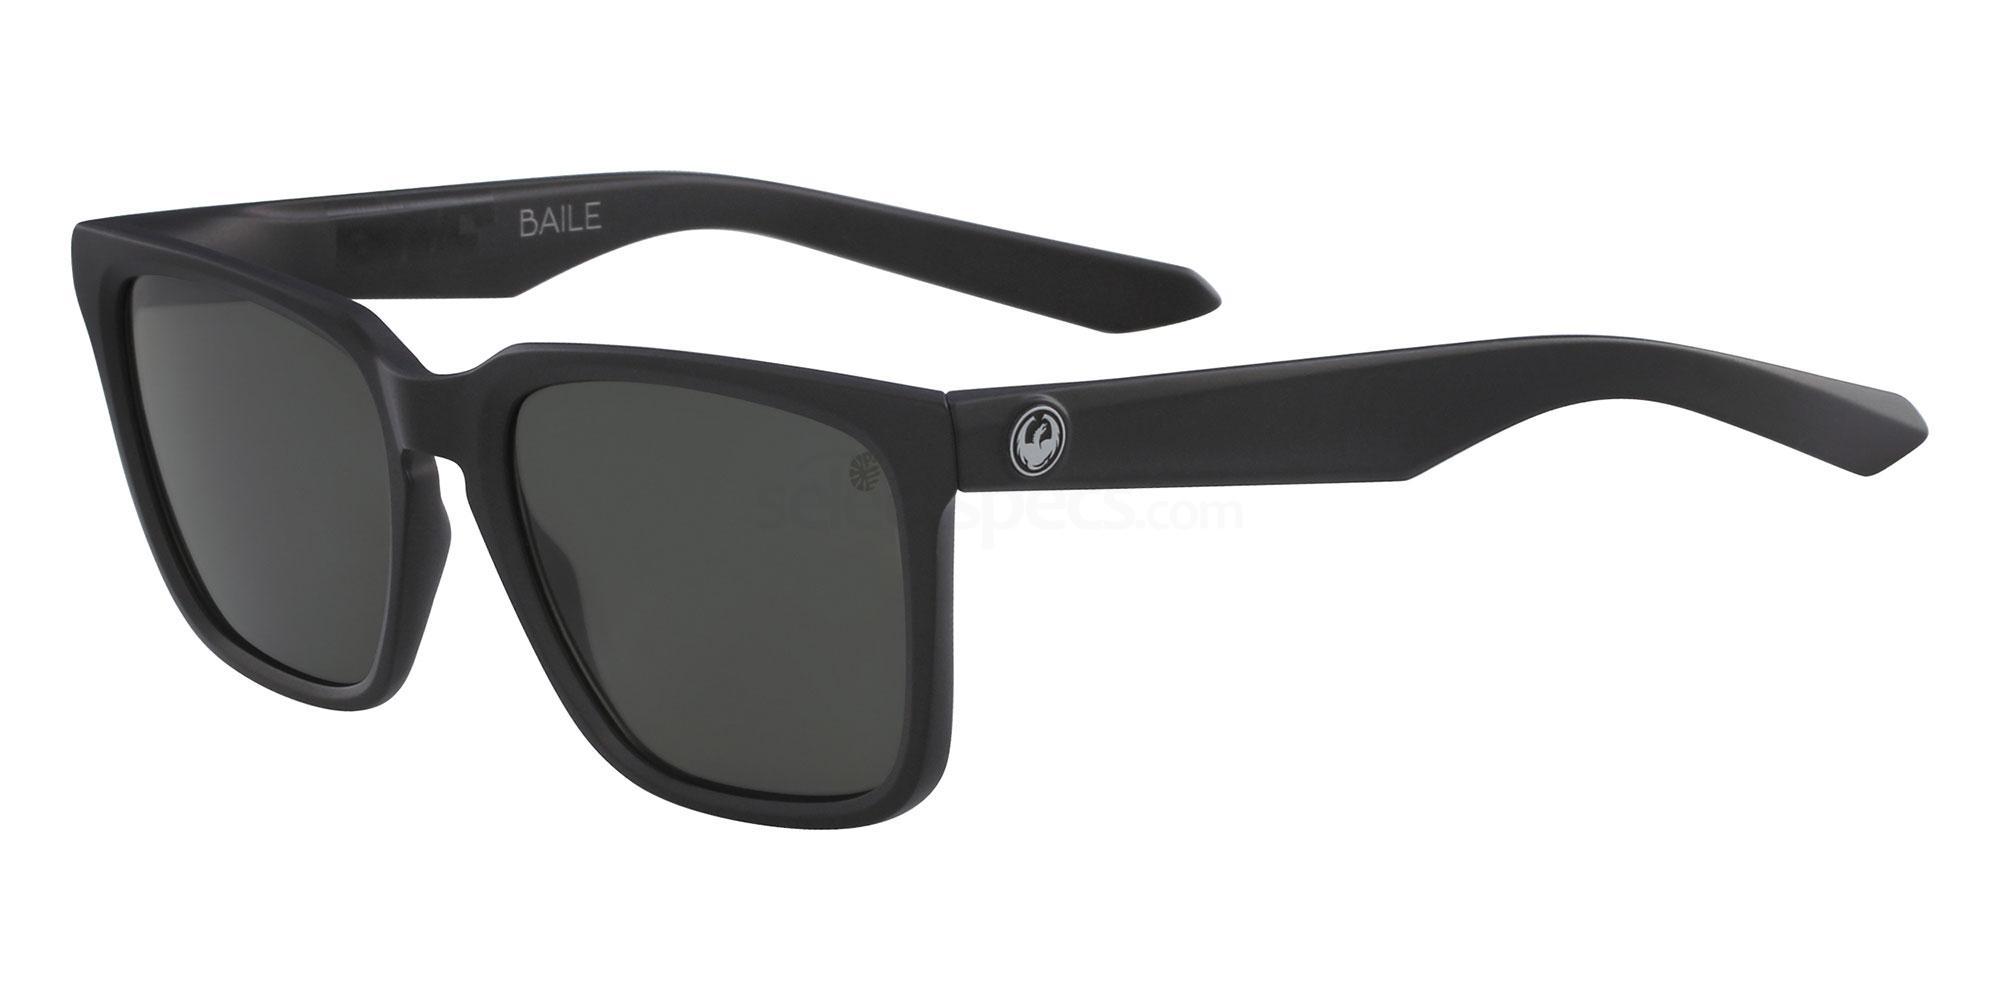 004 DR BAILE LL POLAR Sunglasses, Dragon